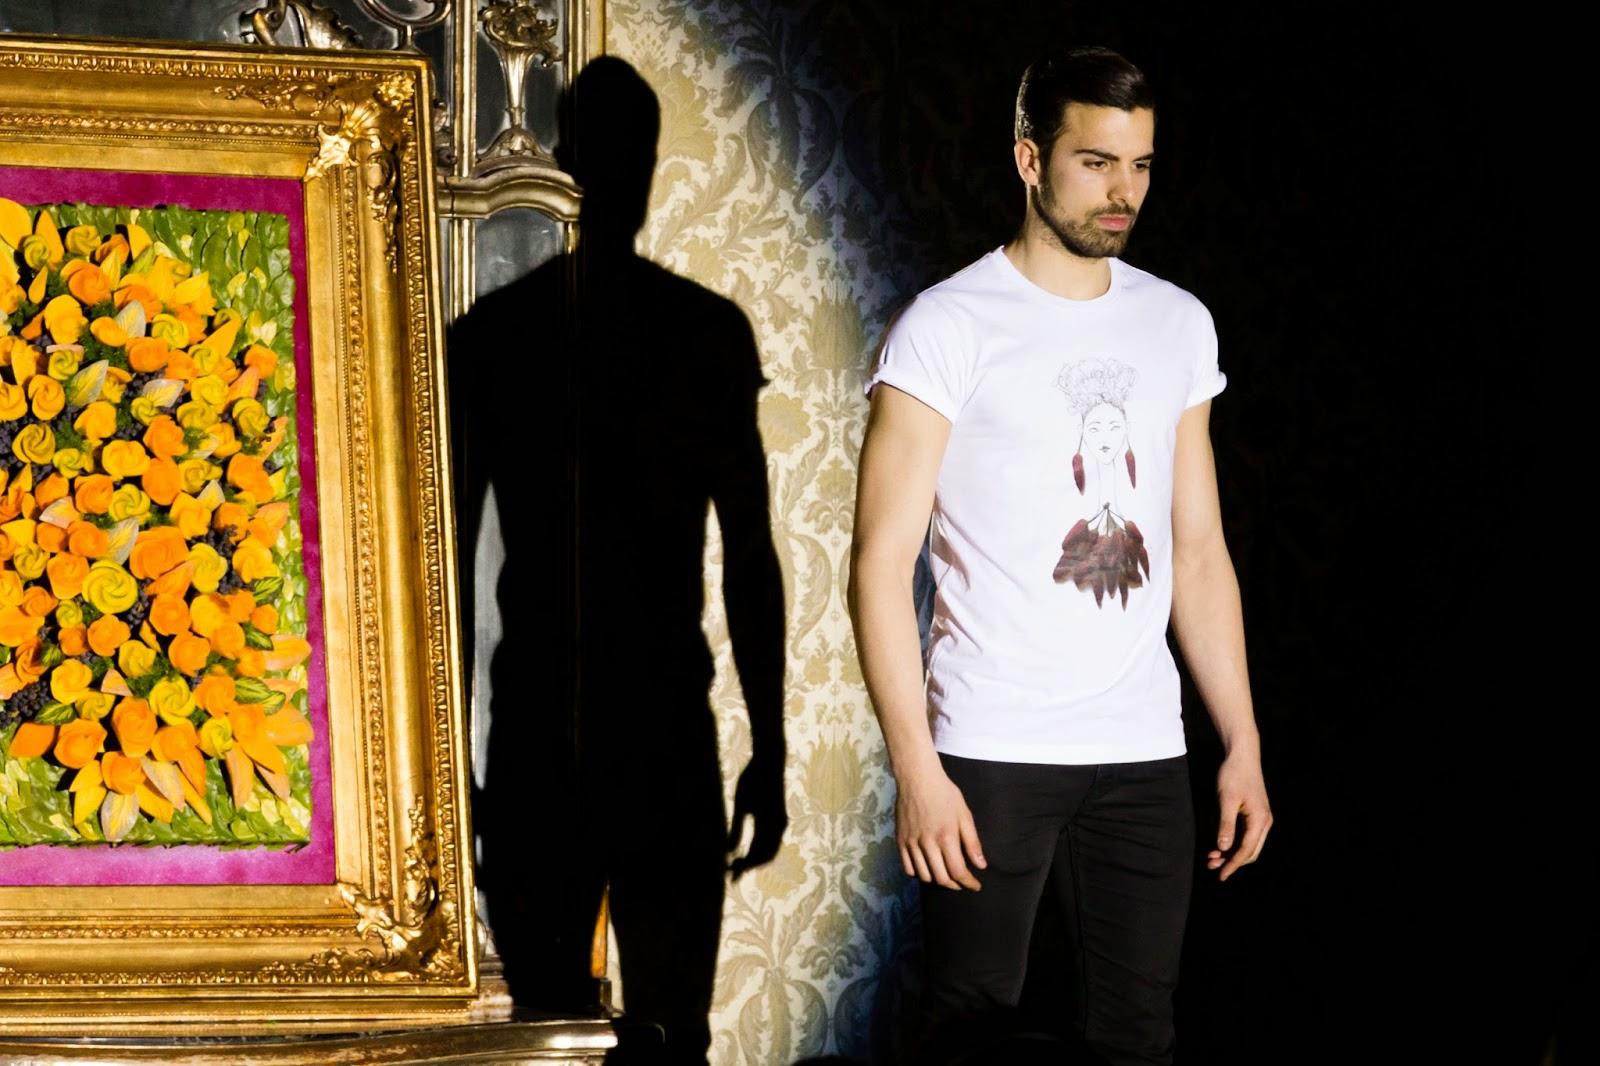 Eniwhere Fashion - Vestimi con Gusto - Milano Fashion Week